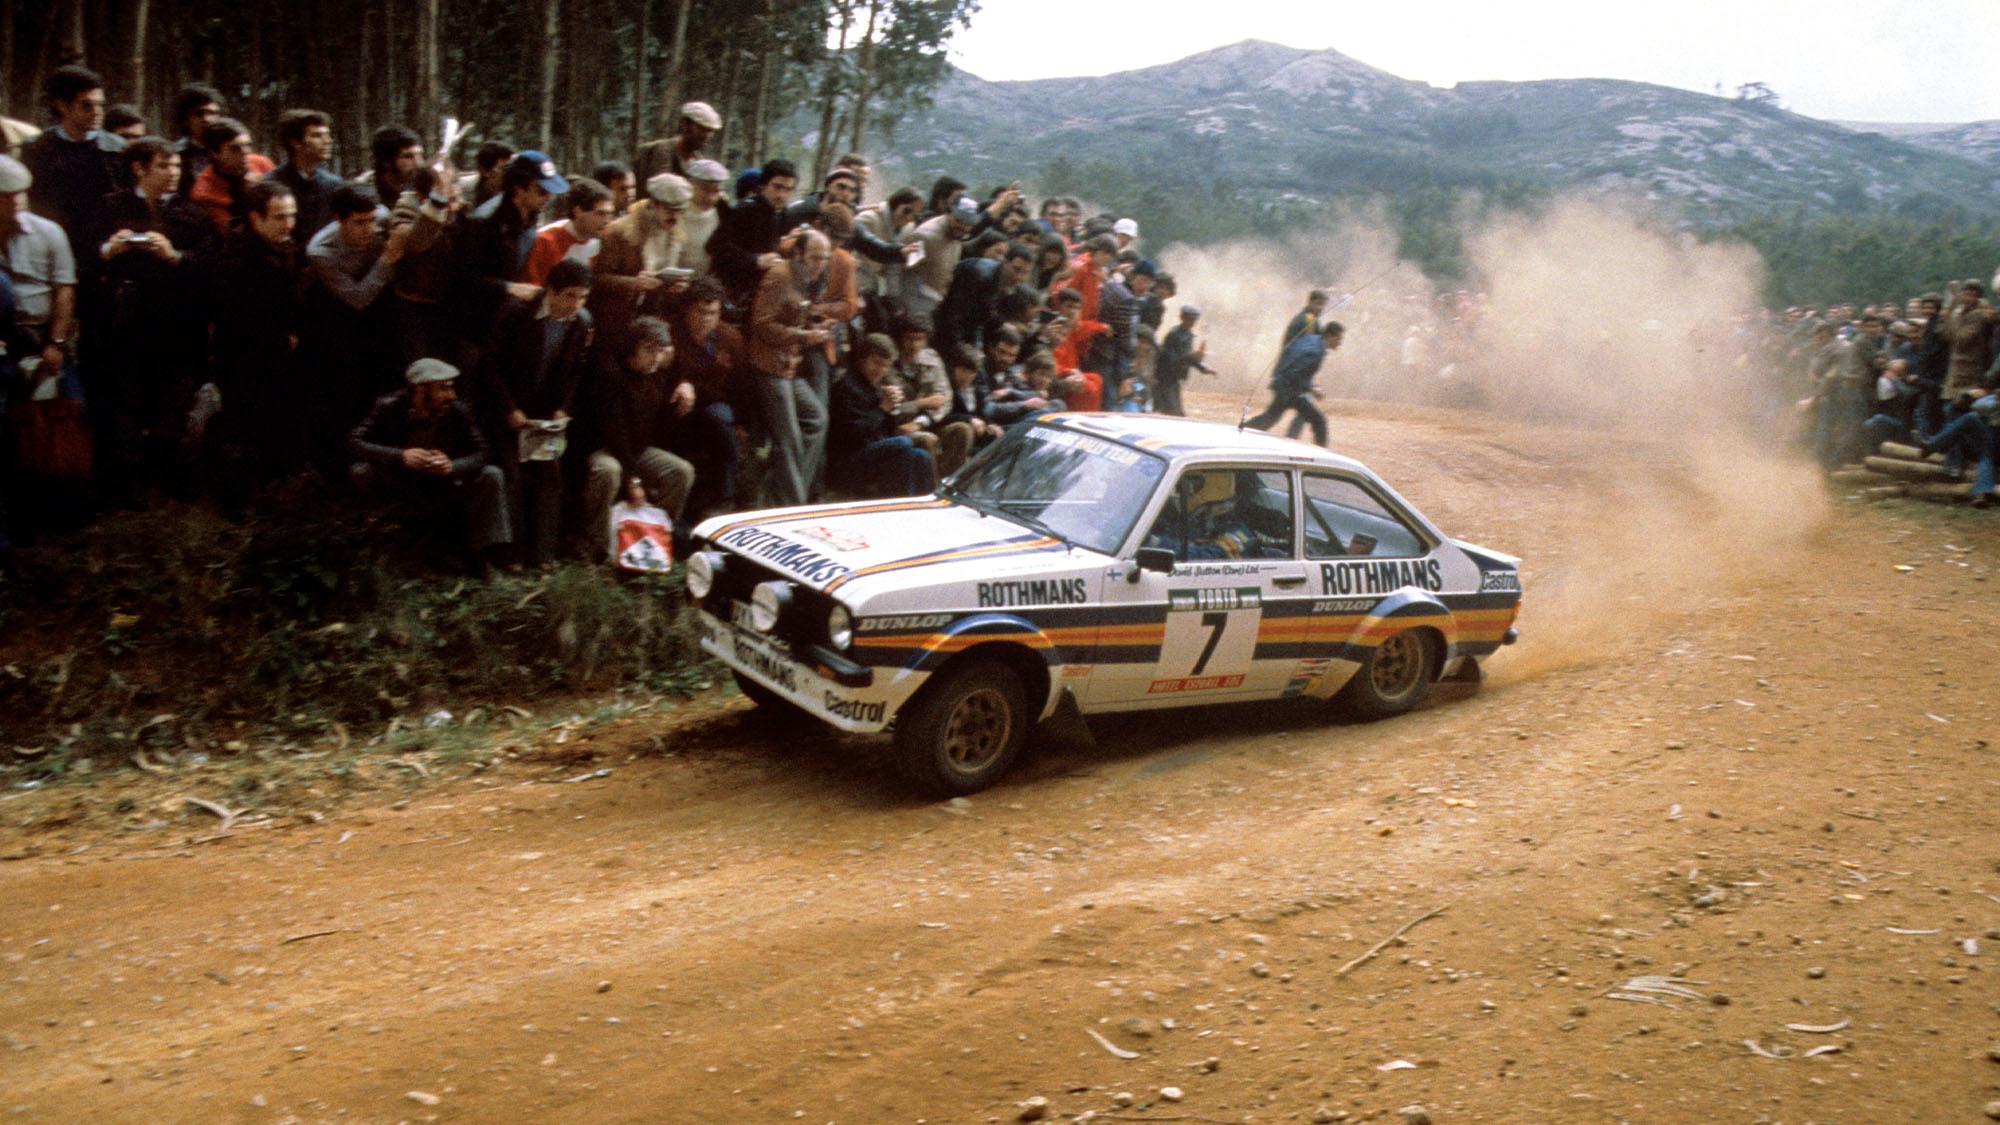 MOTORSPORT - WRC 1980 - RALLYE DE PORTUGAL - ESTORIL (POR) - 05 TO 09/03/1980 - PHOTO: DPPI - Ari Vatanen (FIN) / David Richards (GBR) - Ford Escort RS Gr4 - Action